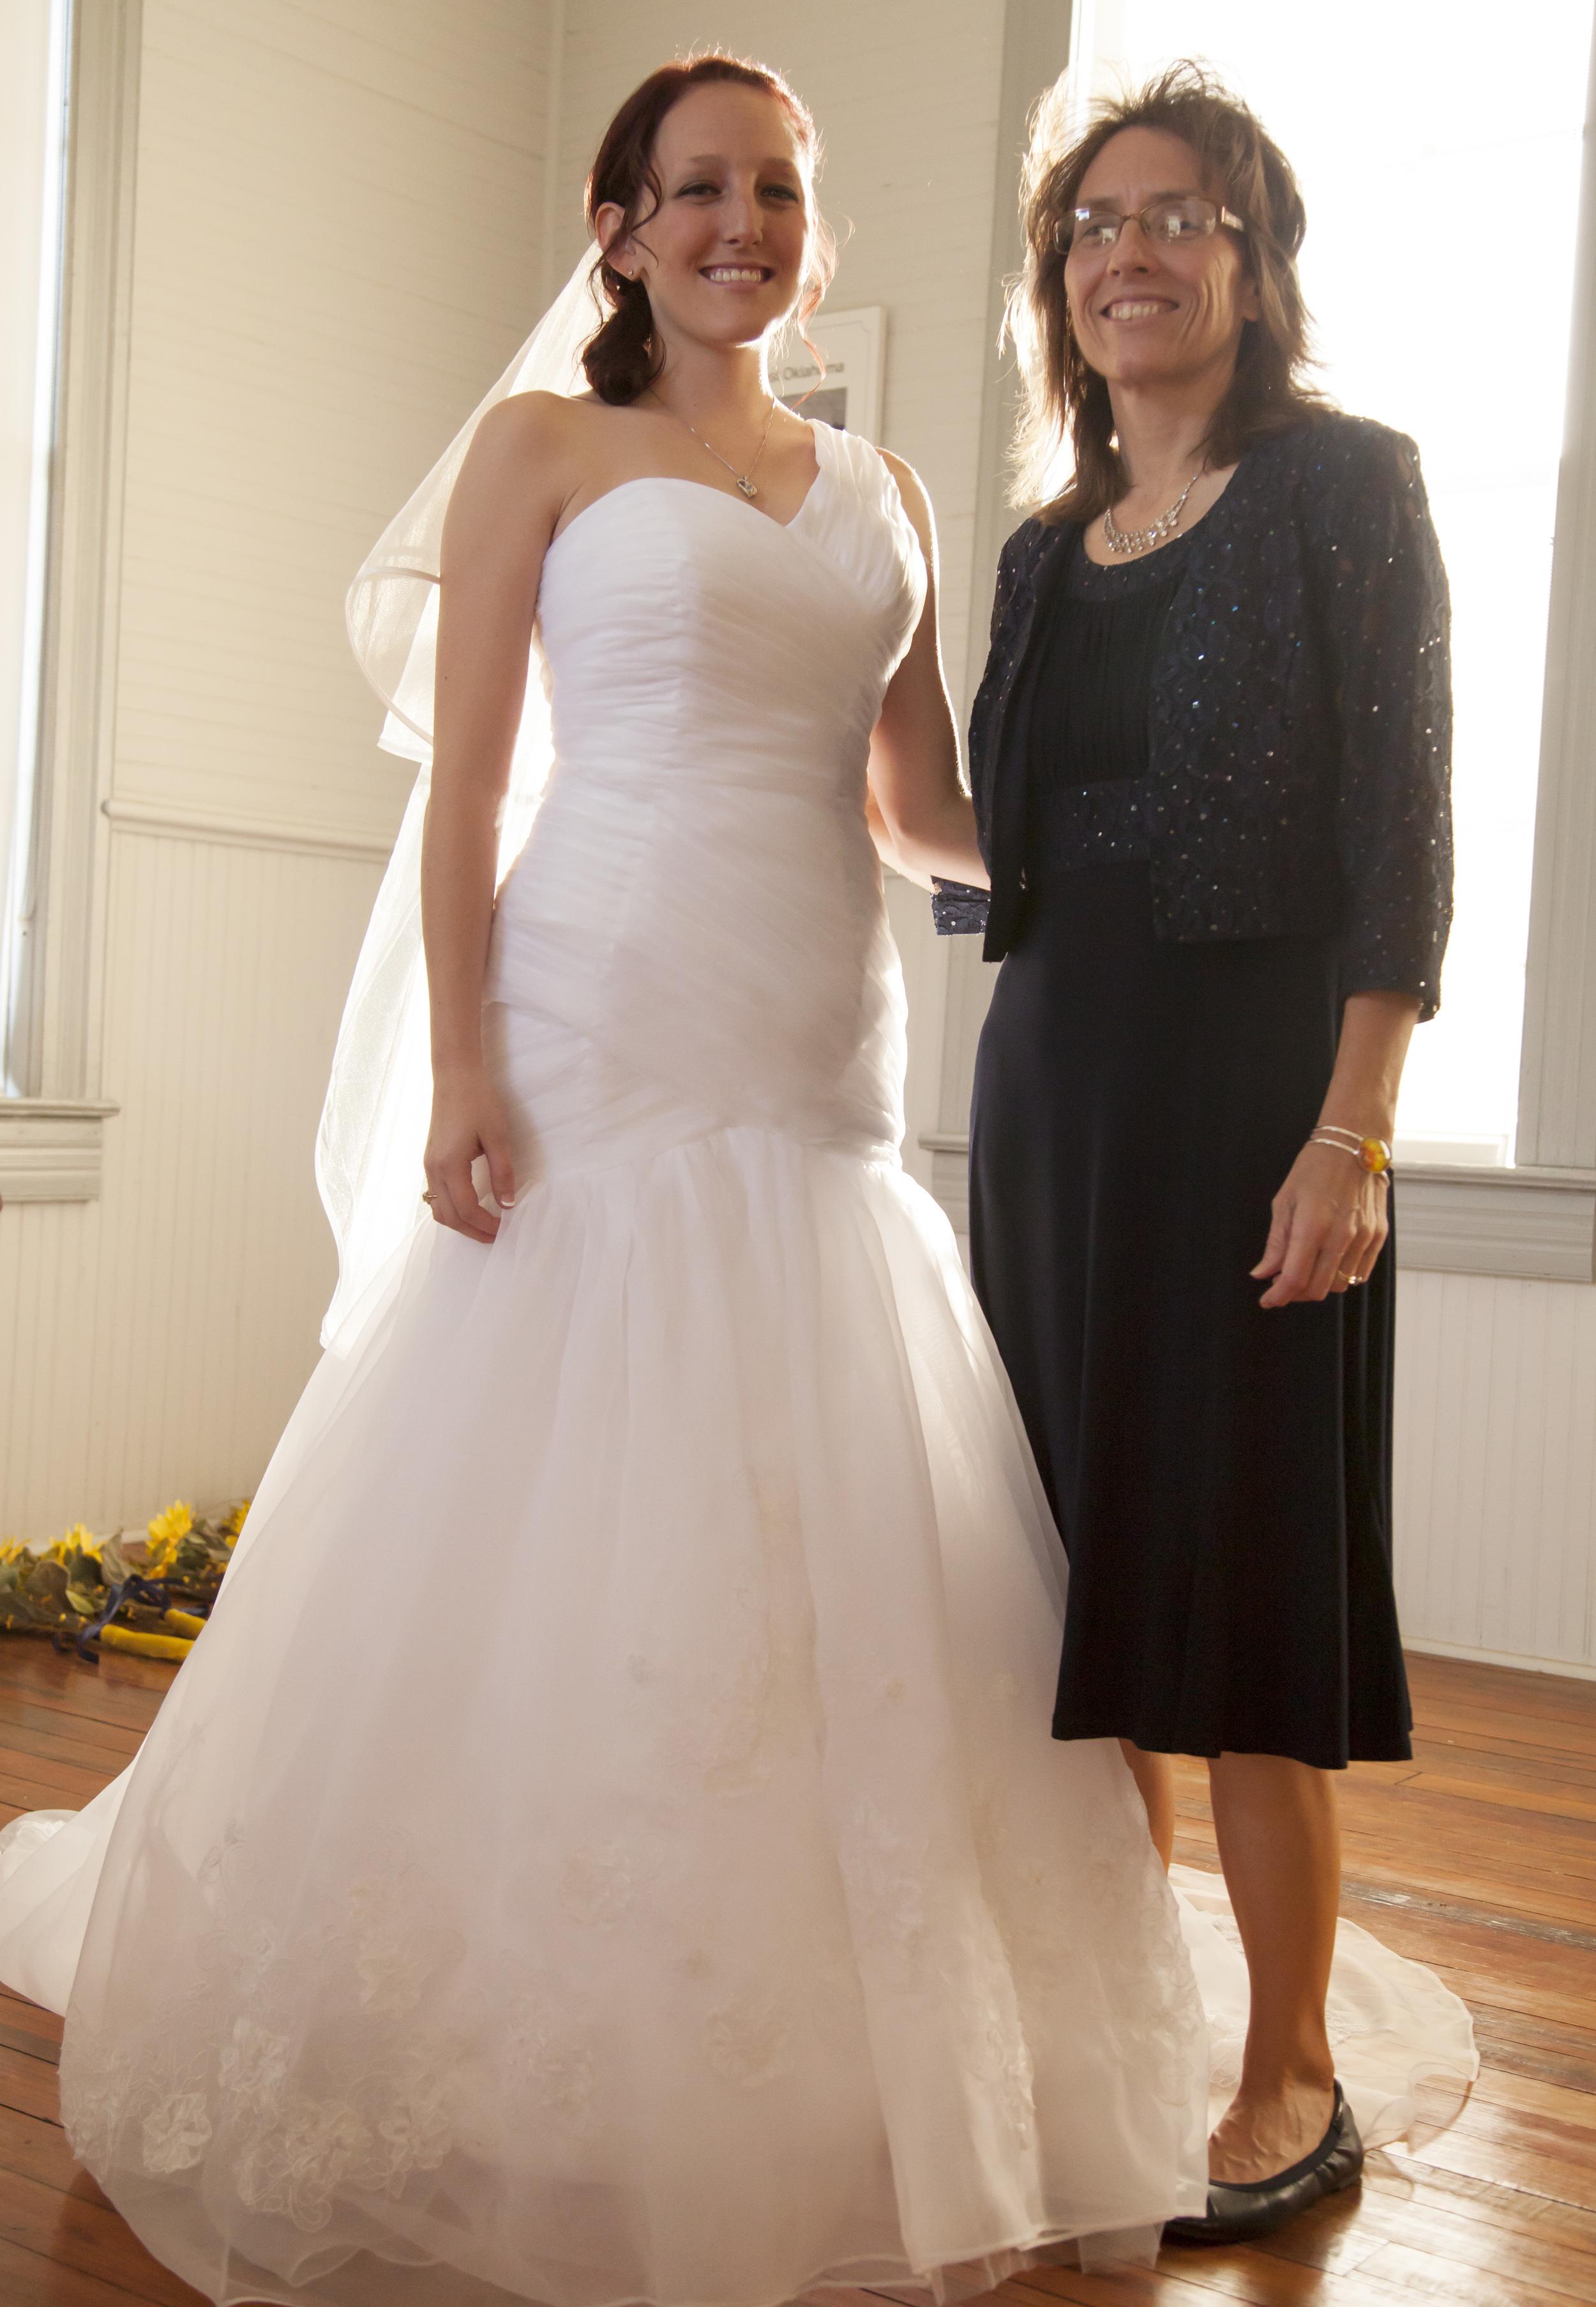 IMG_6470 bride pre wedding.jpg